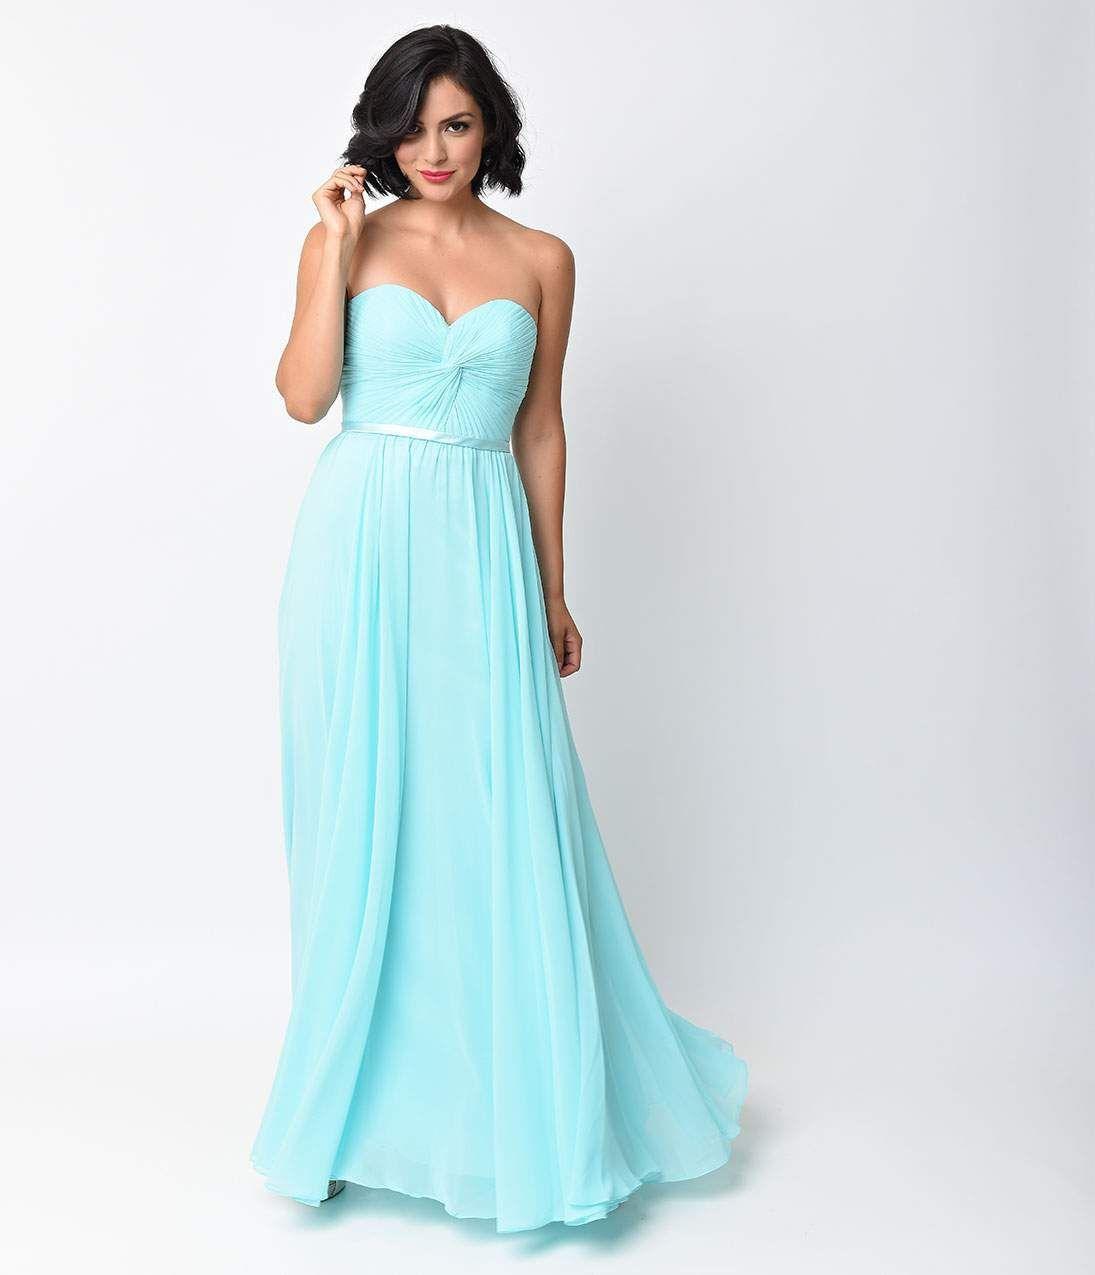 Sky Blue Chiffon Strapless Sweetheart Corset Long Gown